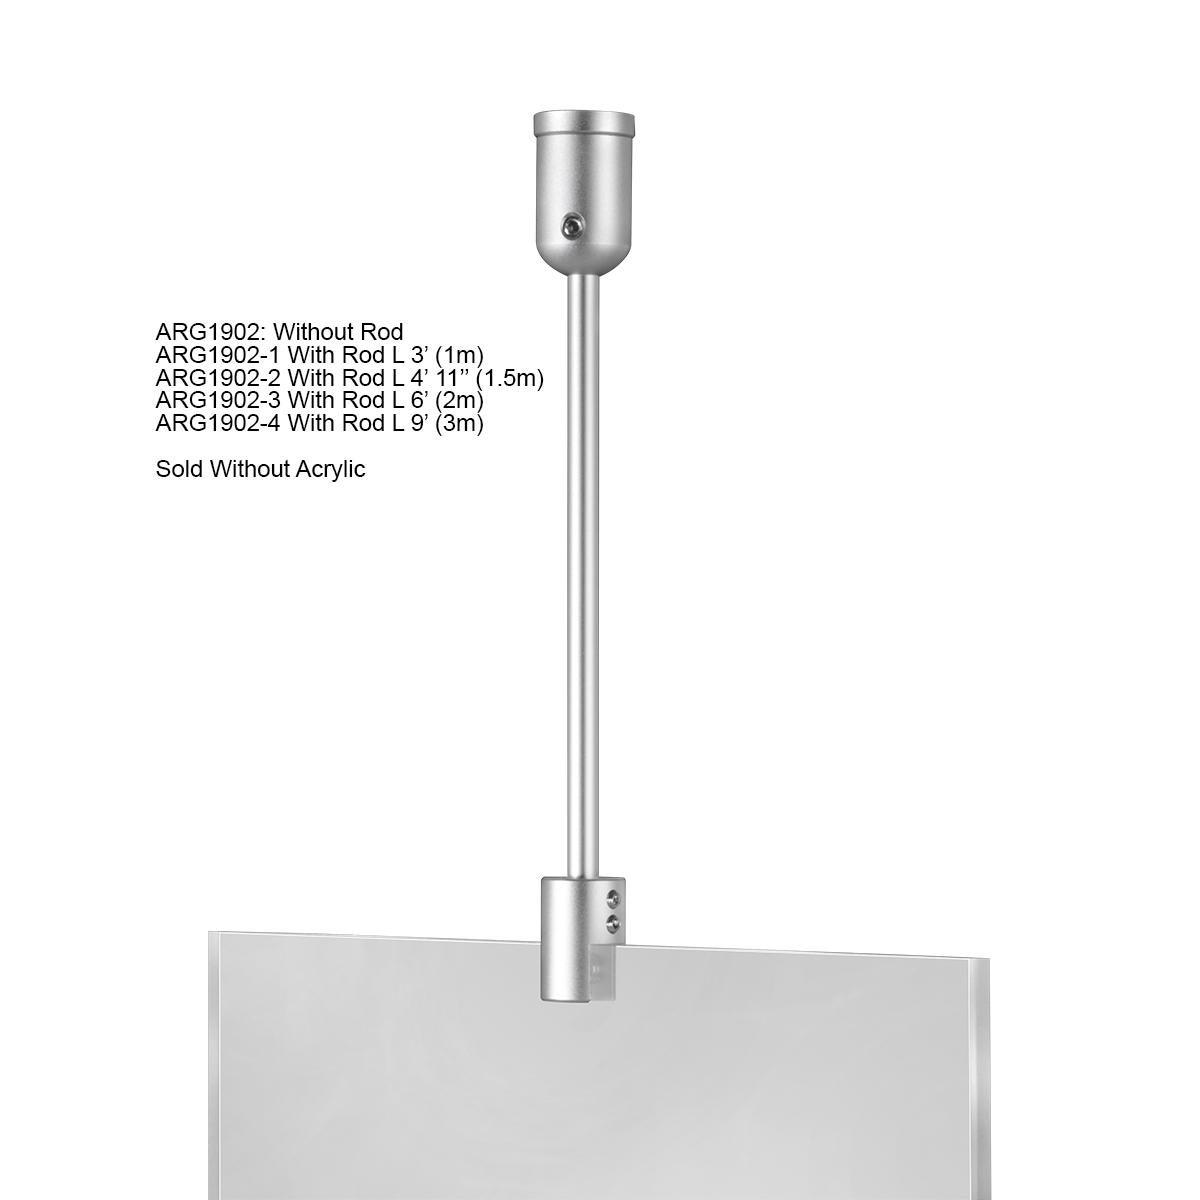 Ceiling Suspended Rod Kit - 9' - Aluminum